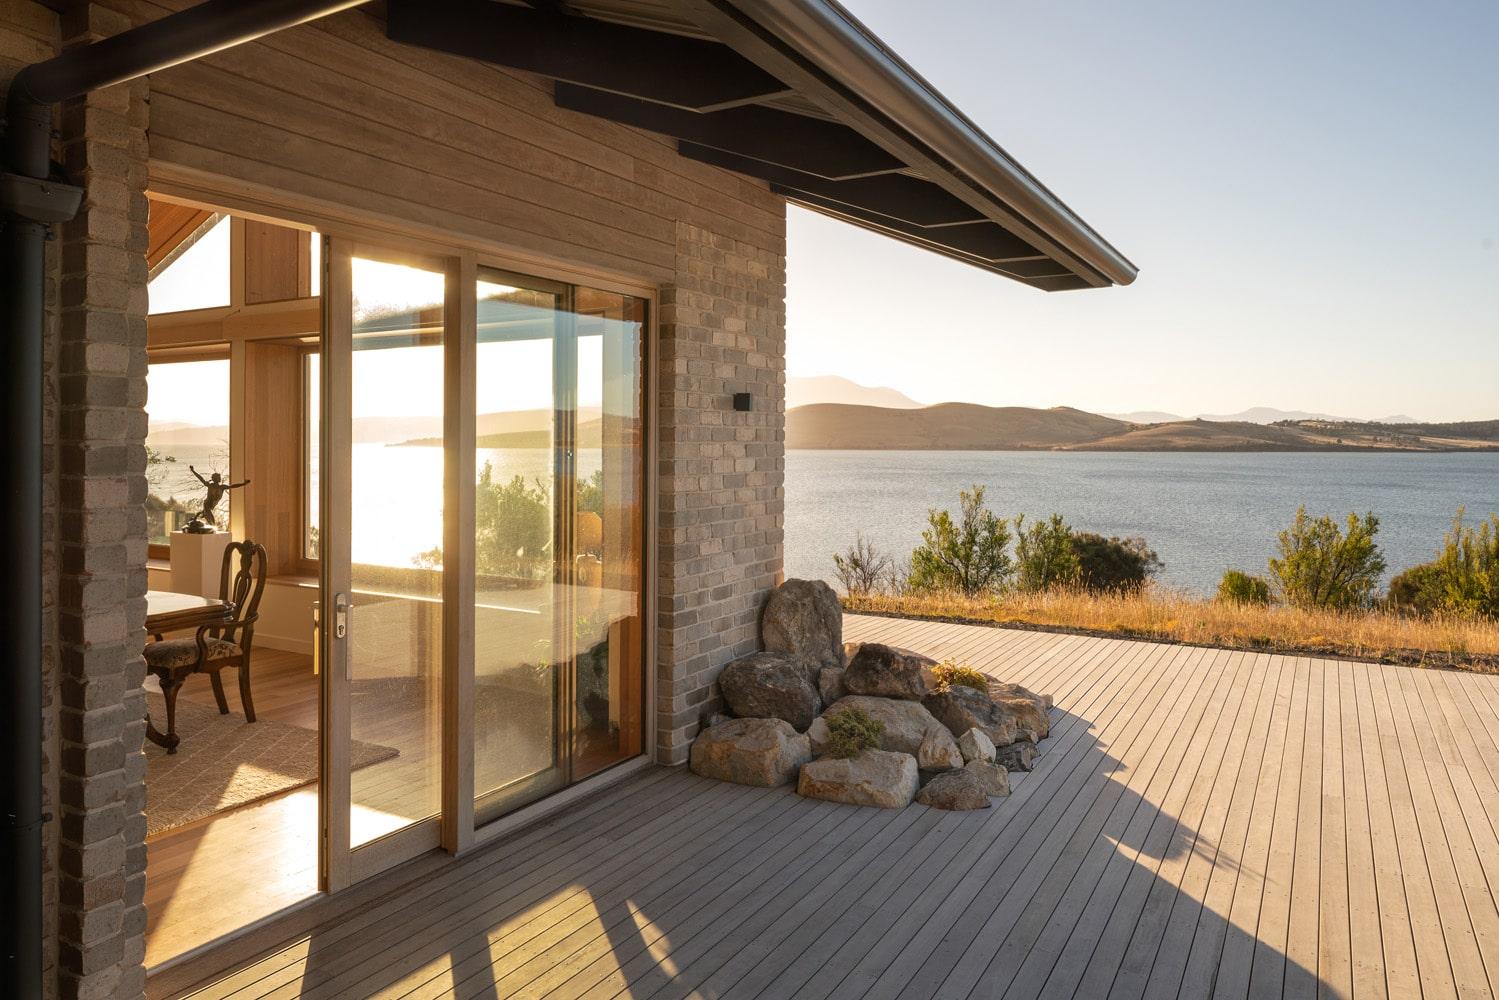 Brick home with timber verandah